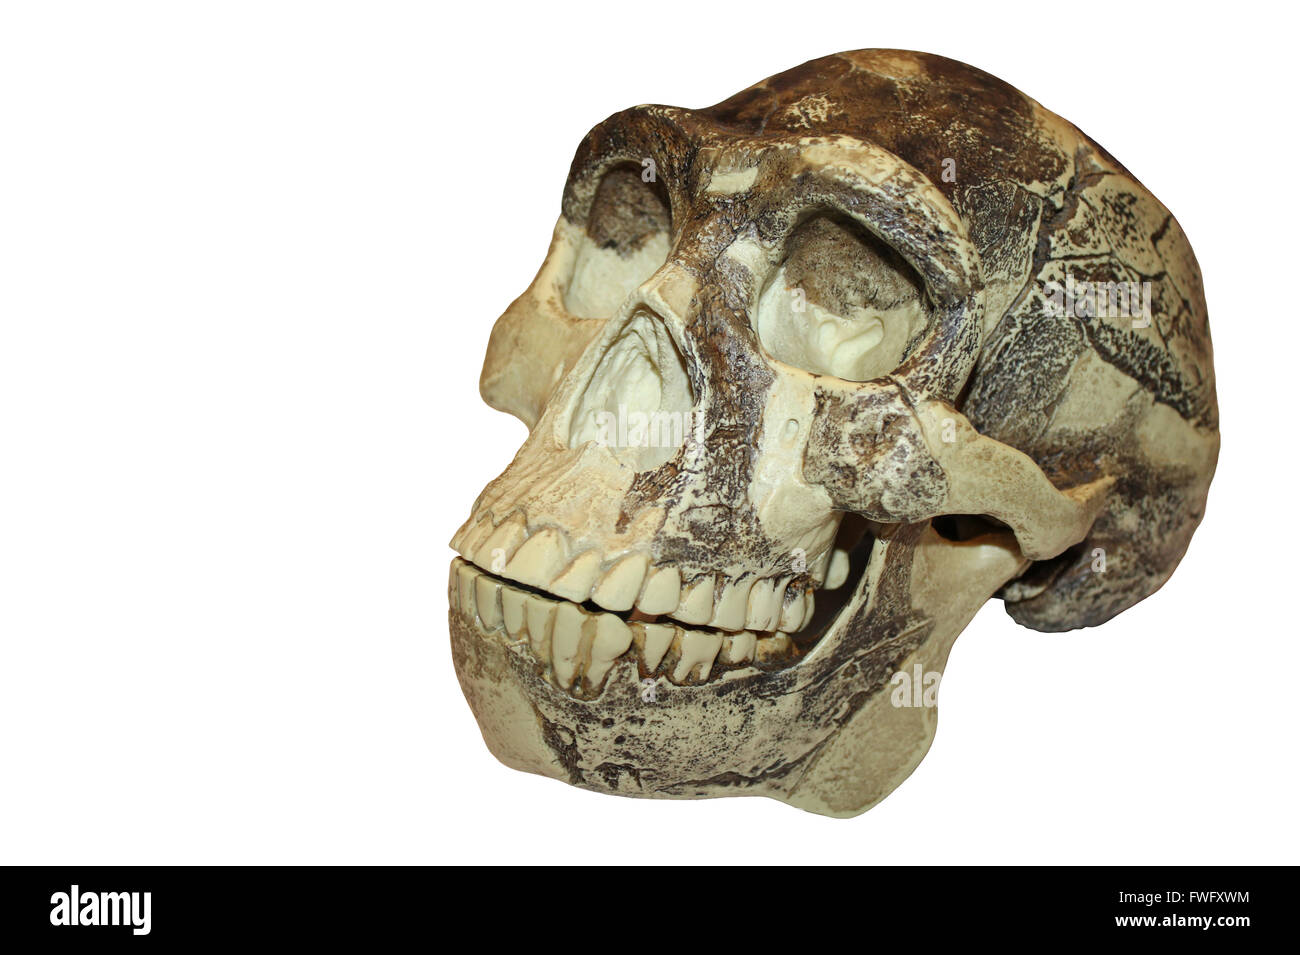 'Peking Man' Zhoukoudian (Choukoutien) Homo erectus Skull - Stock Image